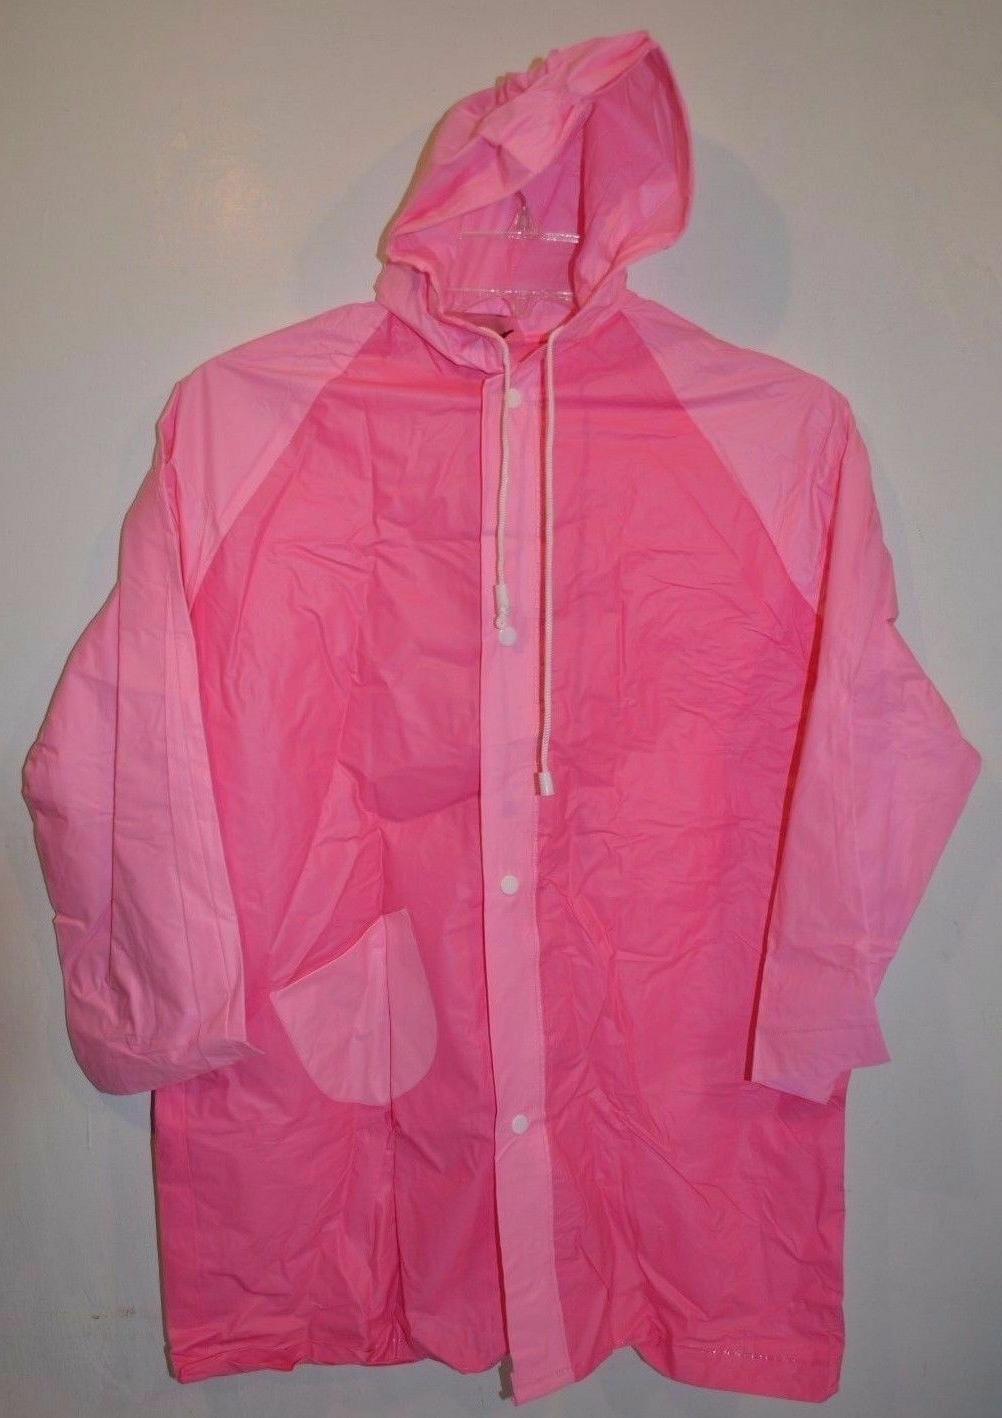 Girl & Boy Water Proof Plastic/PVC Rain Coat For Children 6-